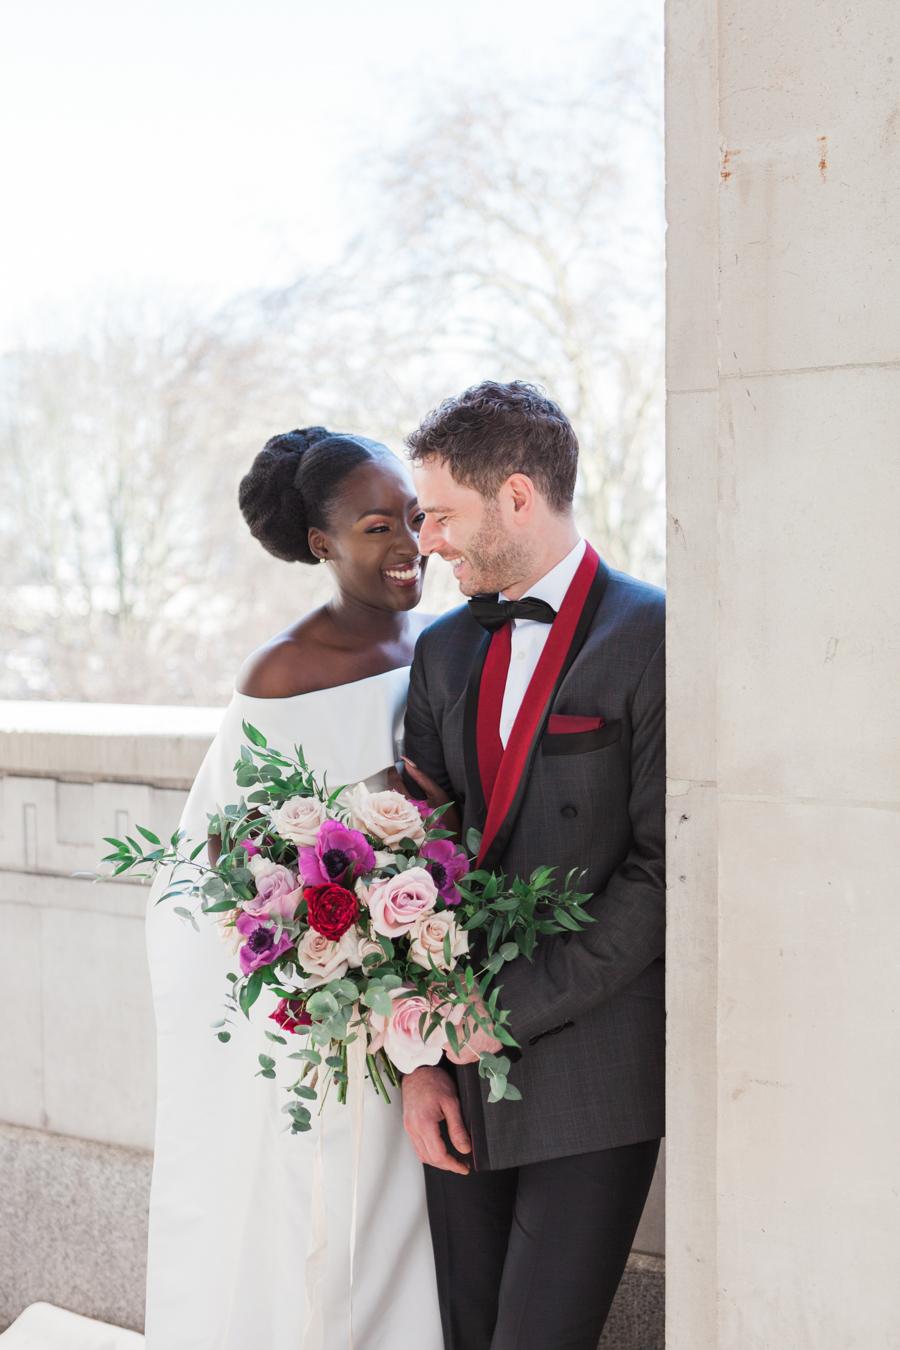 Breathtakingly beautiful - diversity wins in this stunning RSA London wedding editorial! (5)